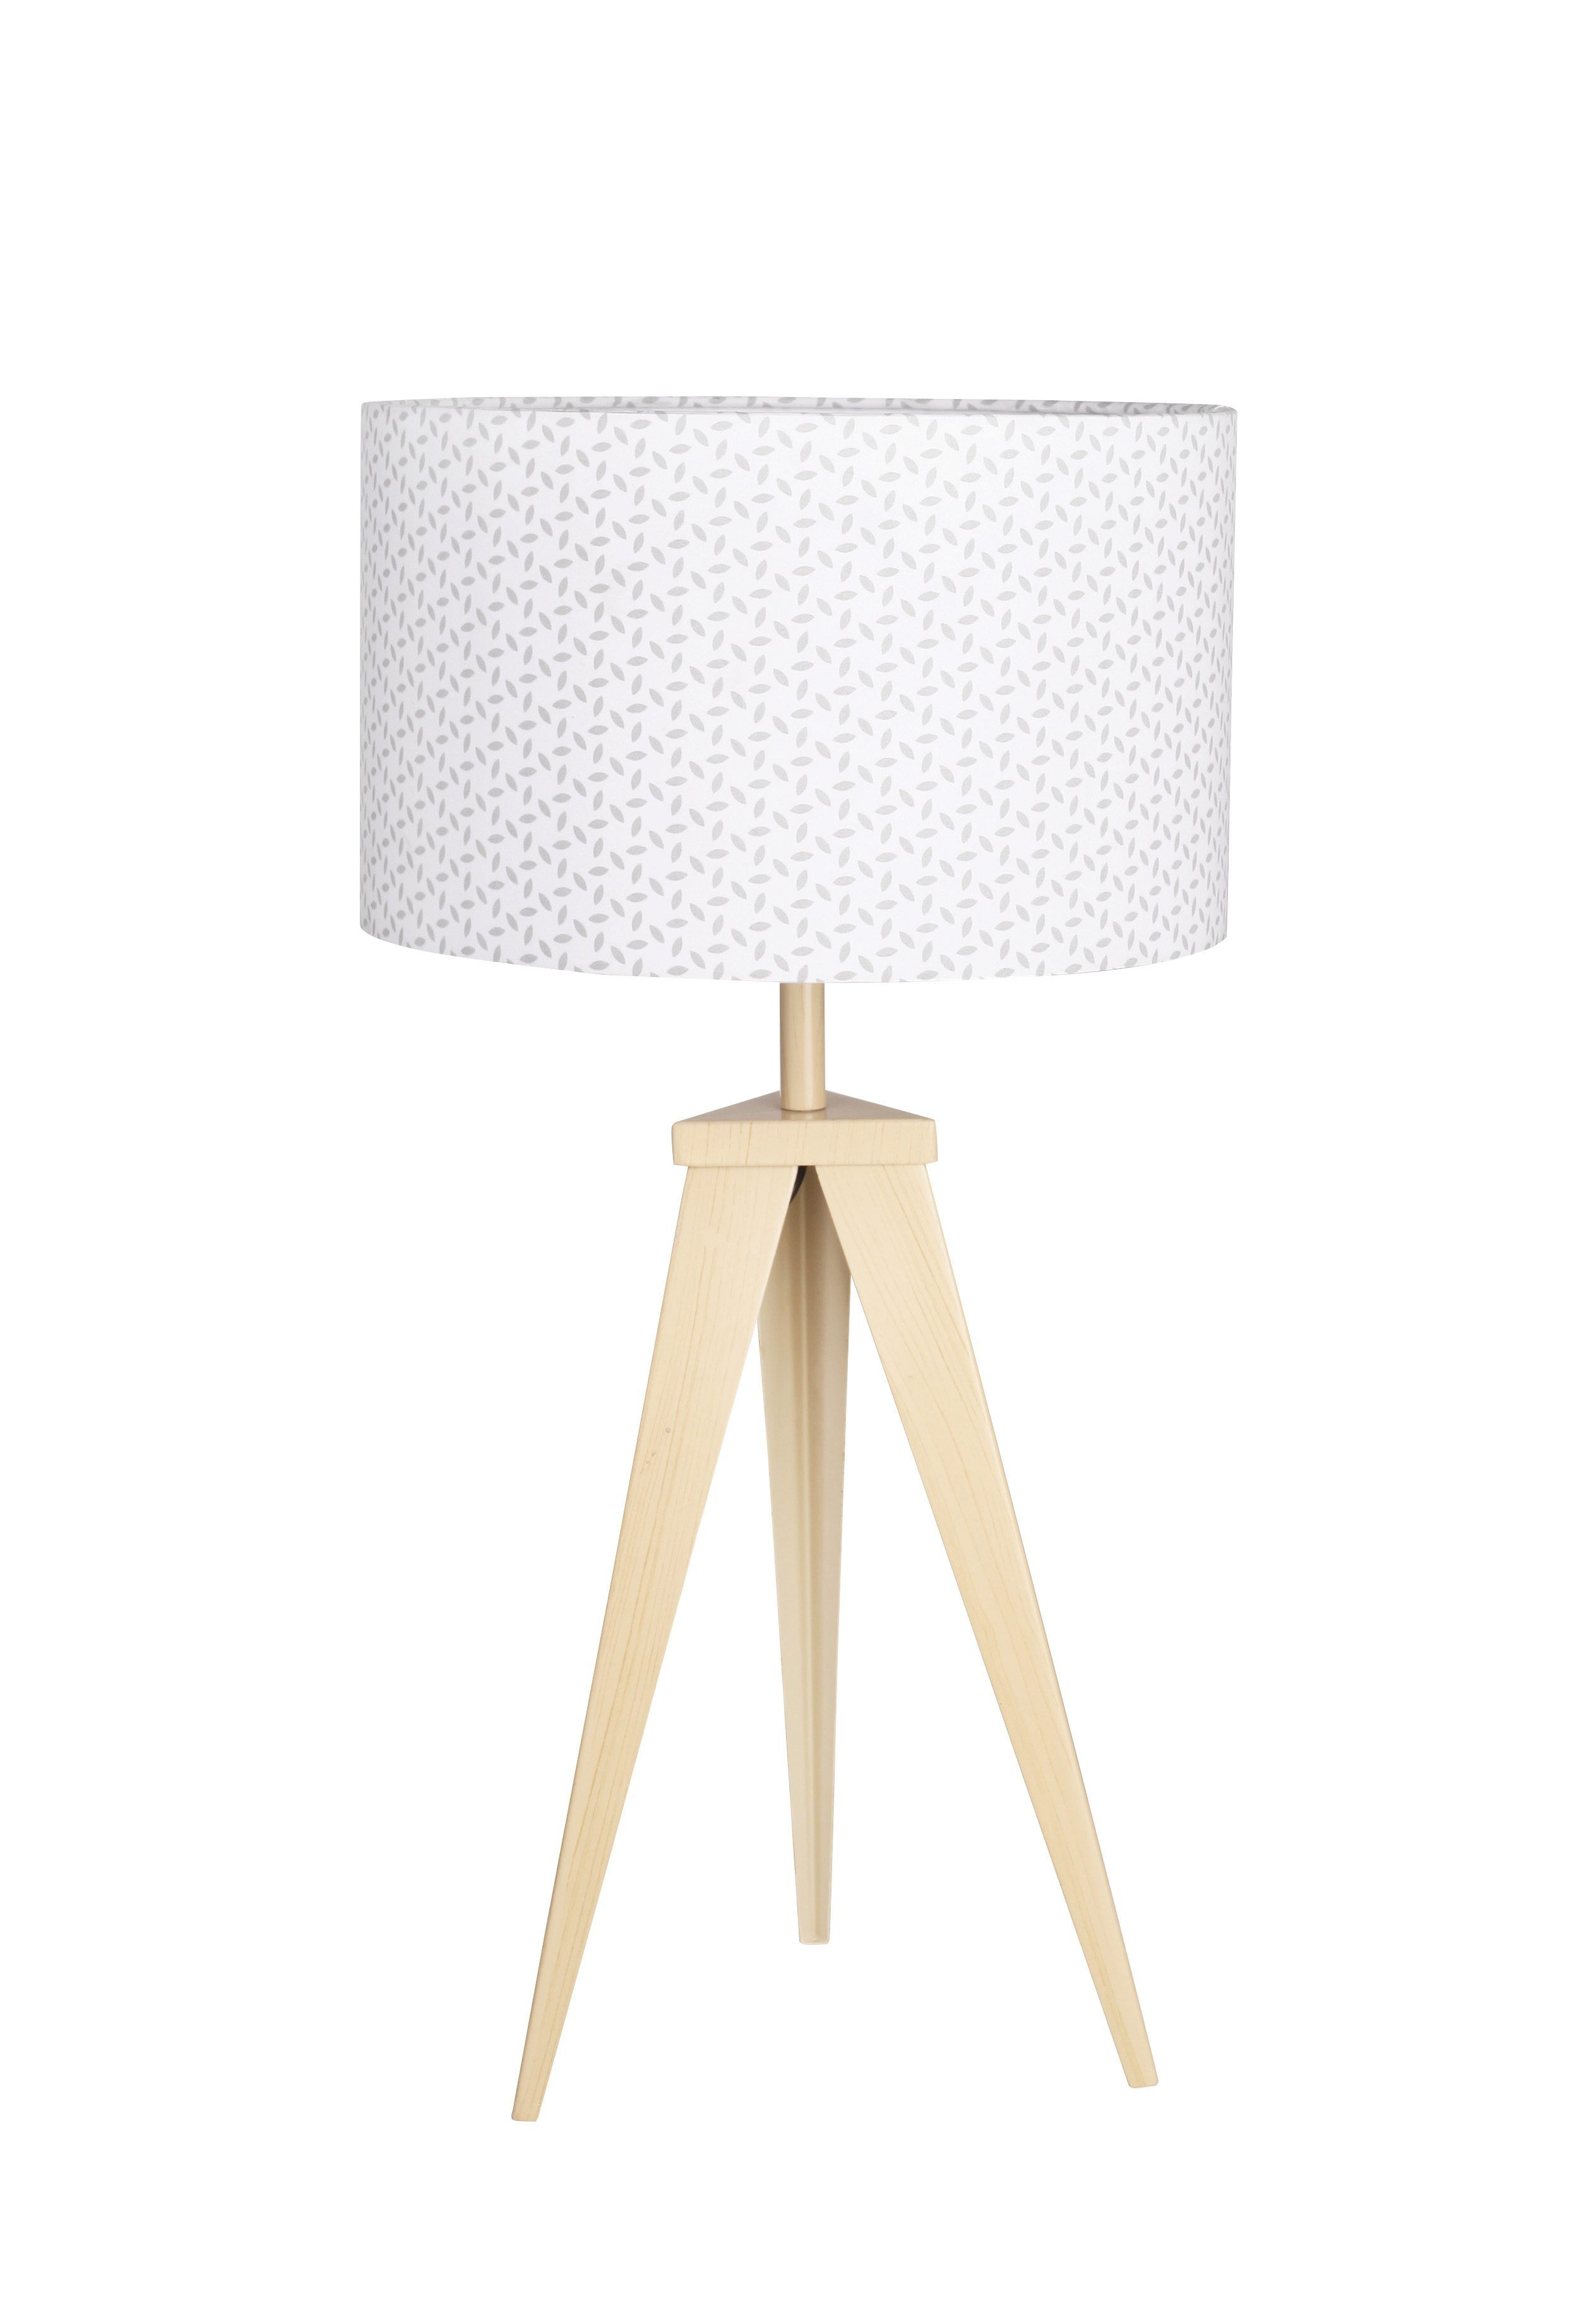 Lampe A Poser Tripod Montreal Naturel Lamp Lampe A Poser